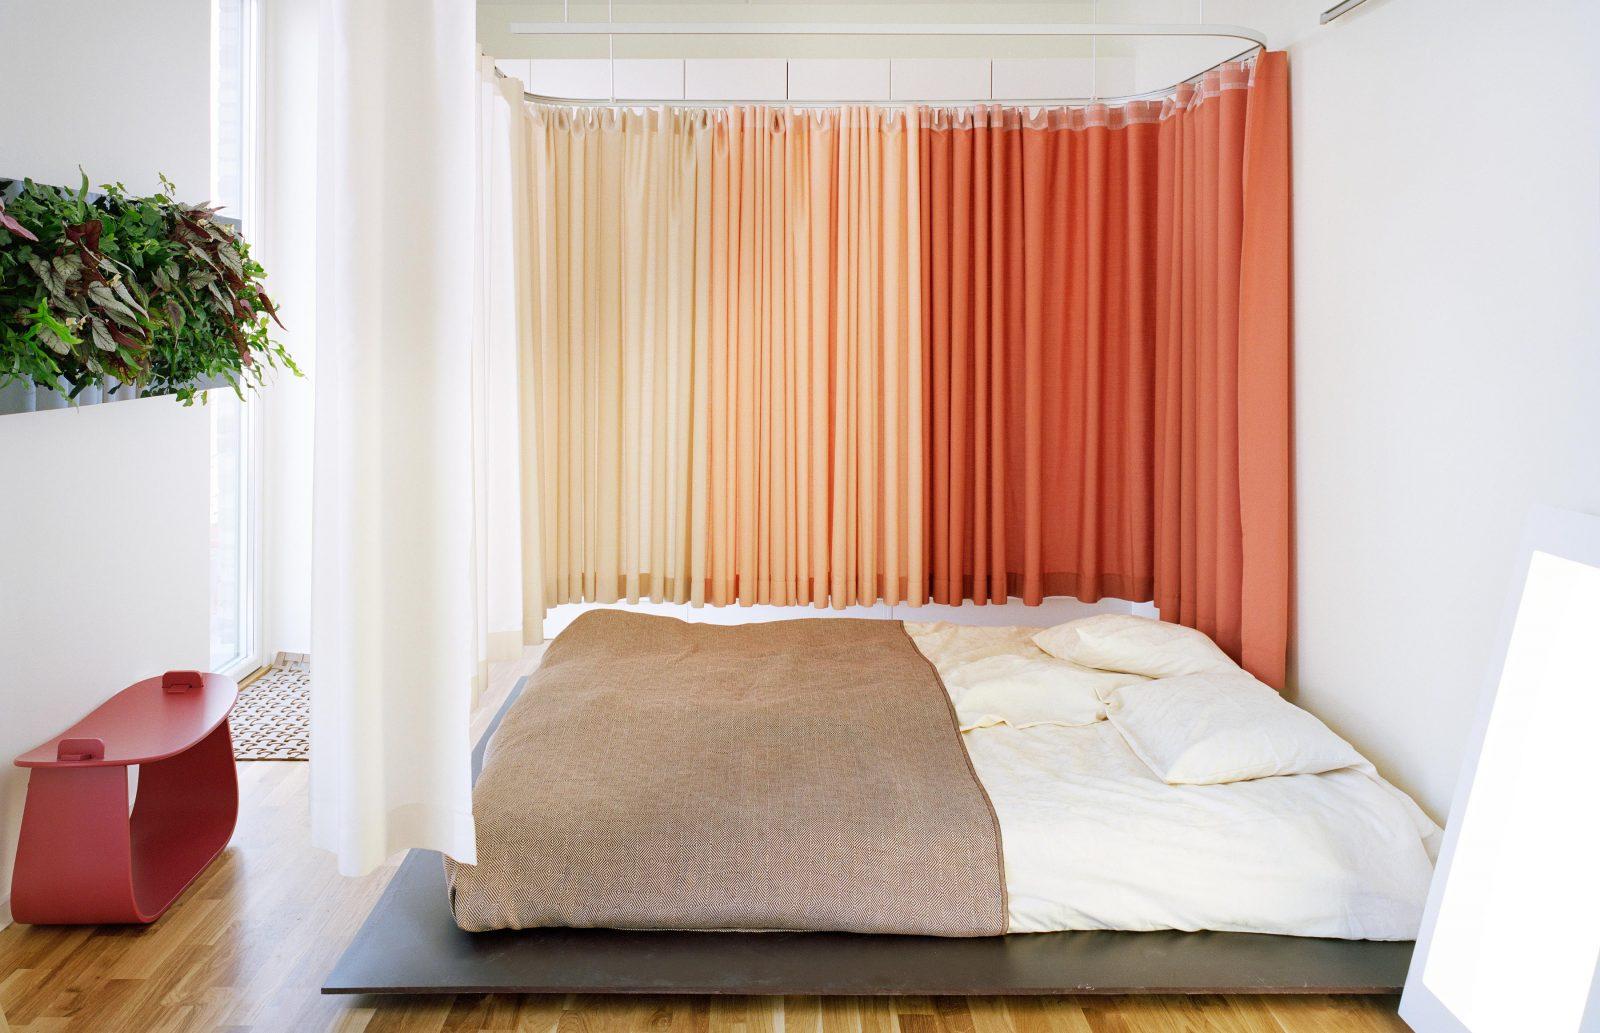 KjellanderSjober Access Annedal bedroom